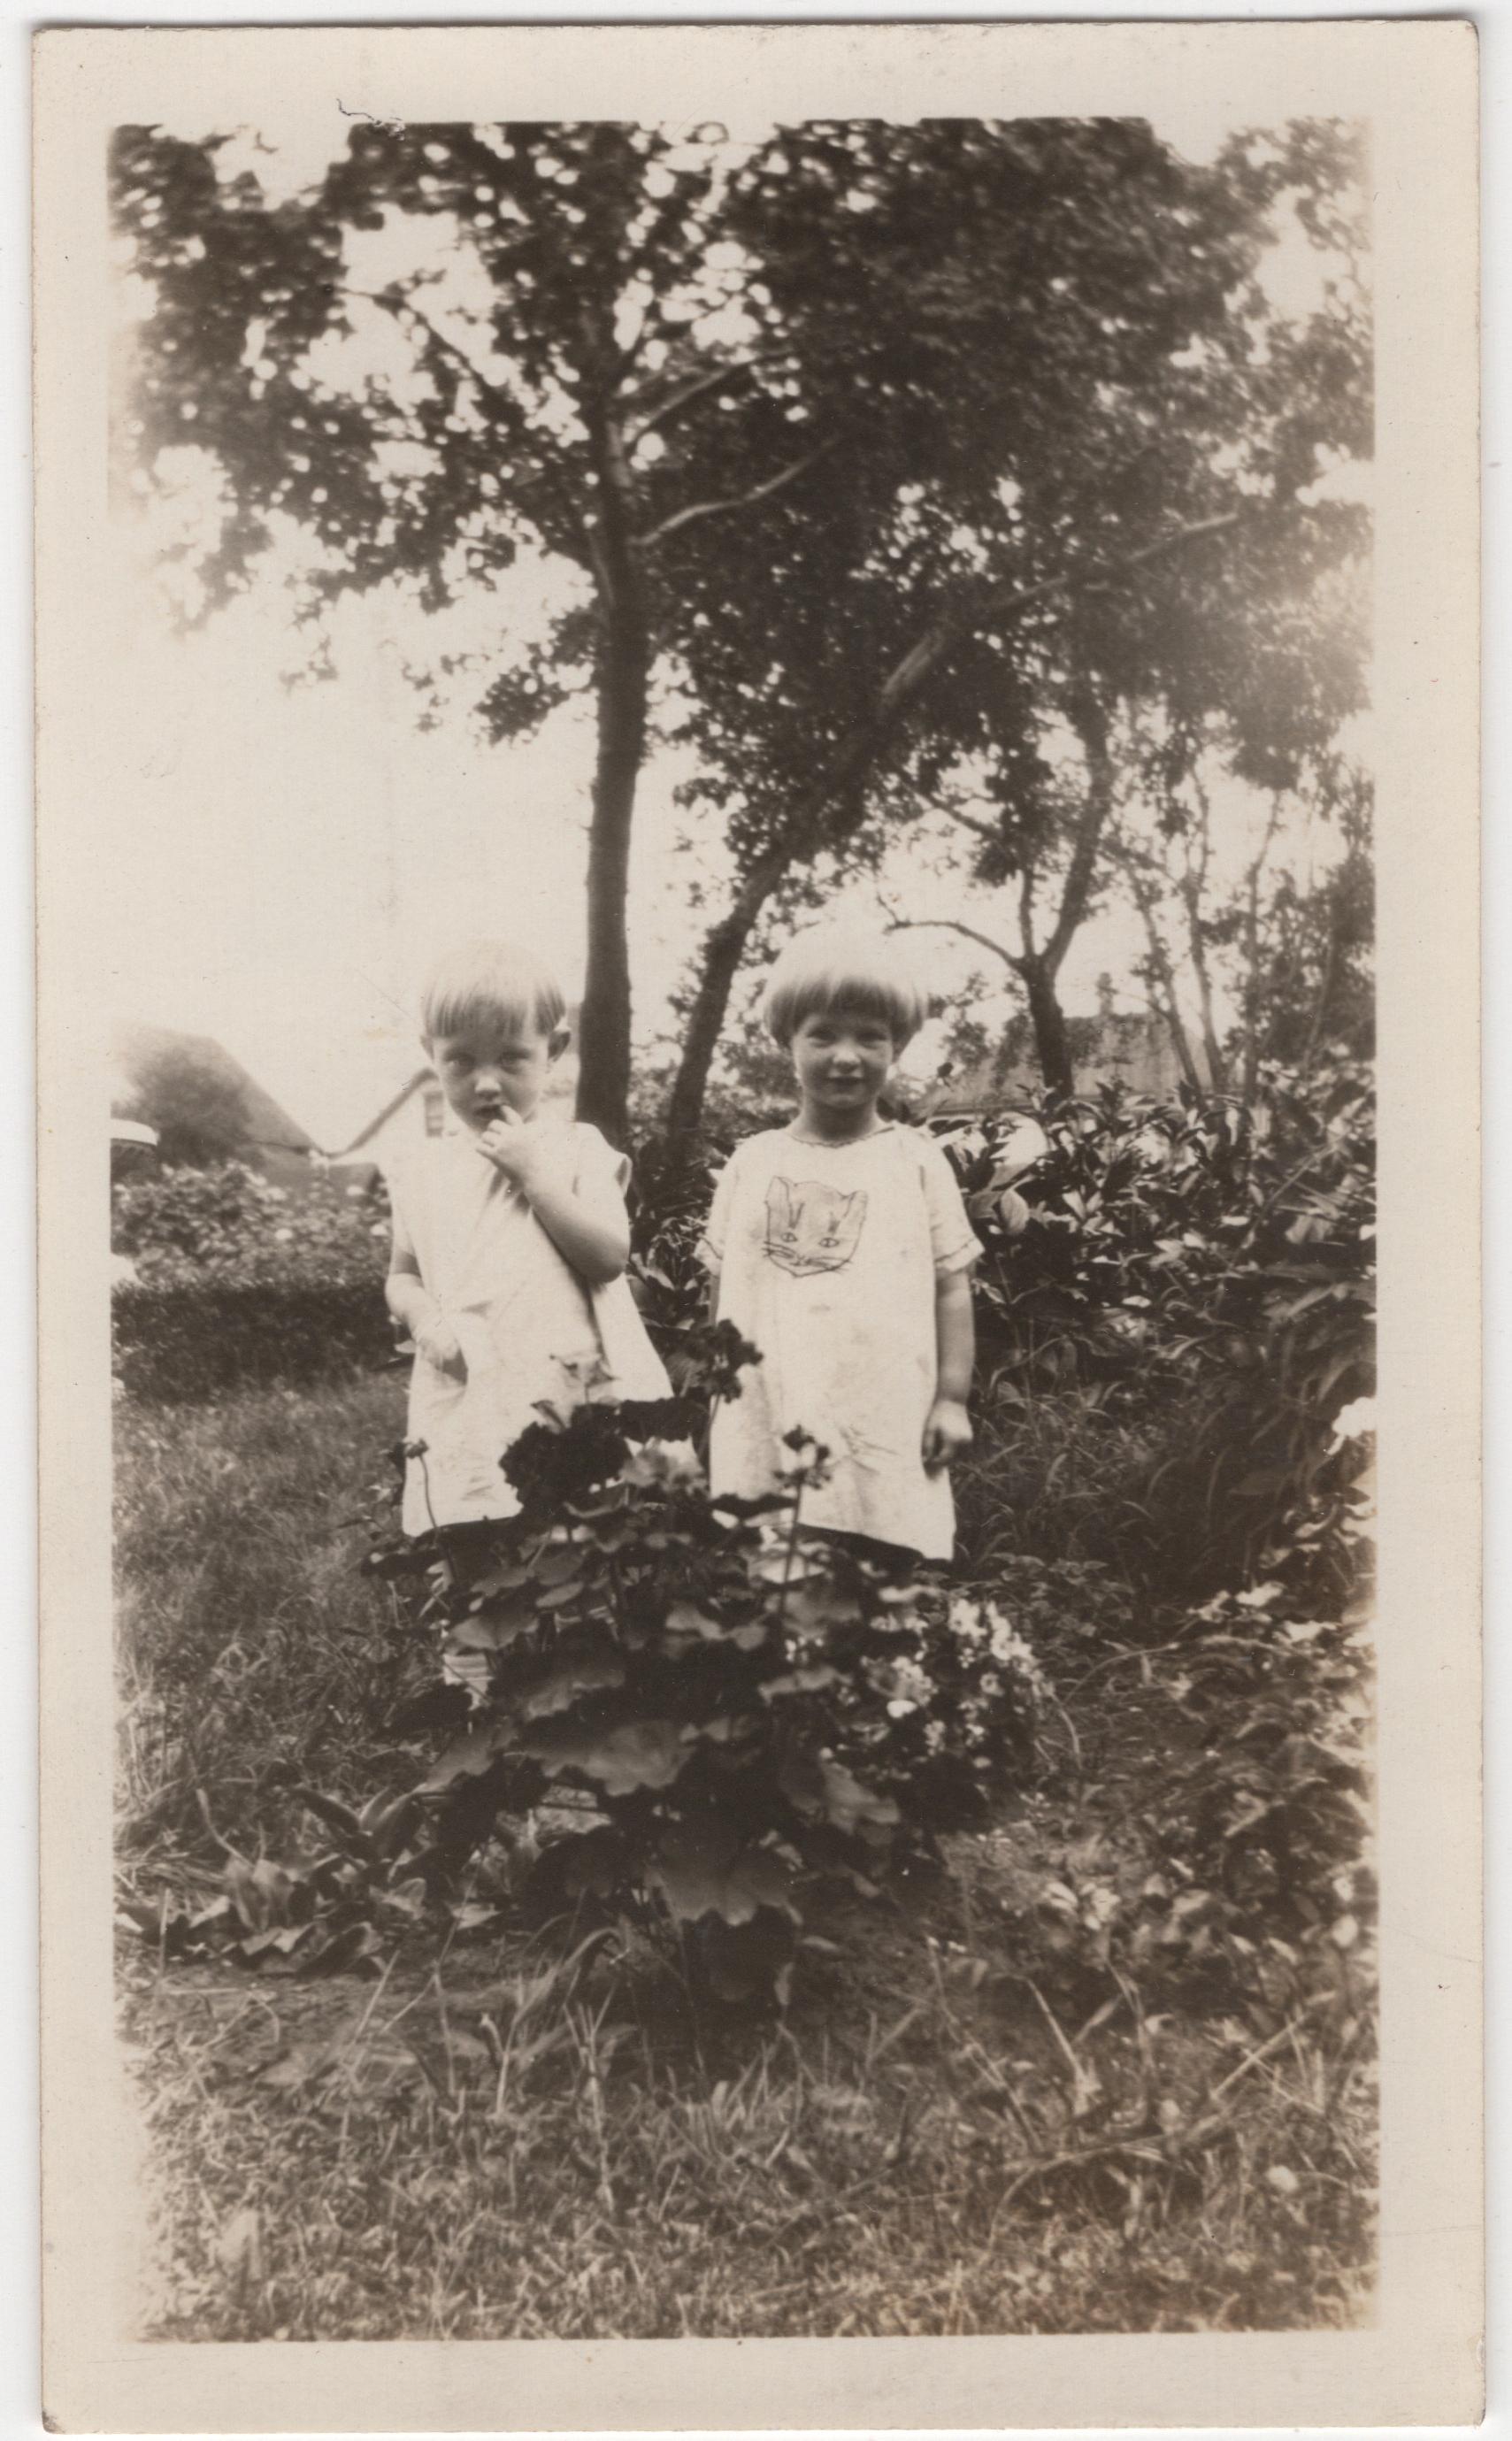 Millie and Jeanette Kaiser, 1926